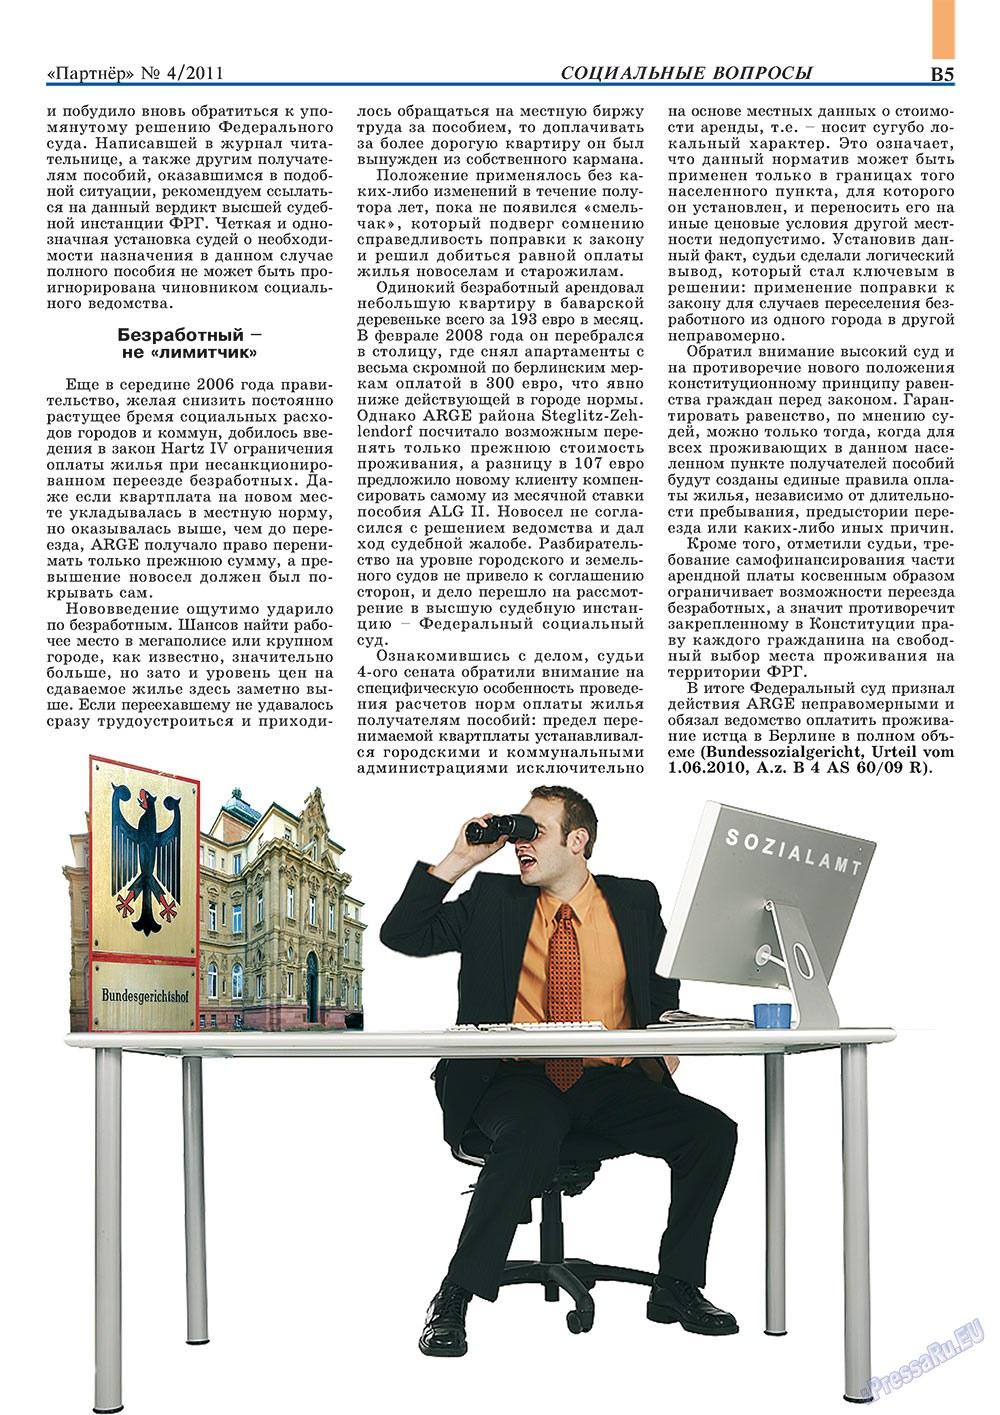 Партнер-север (журнал). 2011 год, номер 4, стр. 15